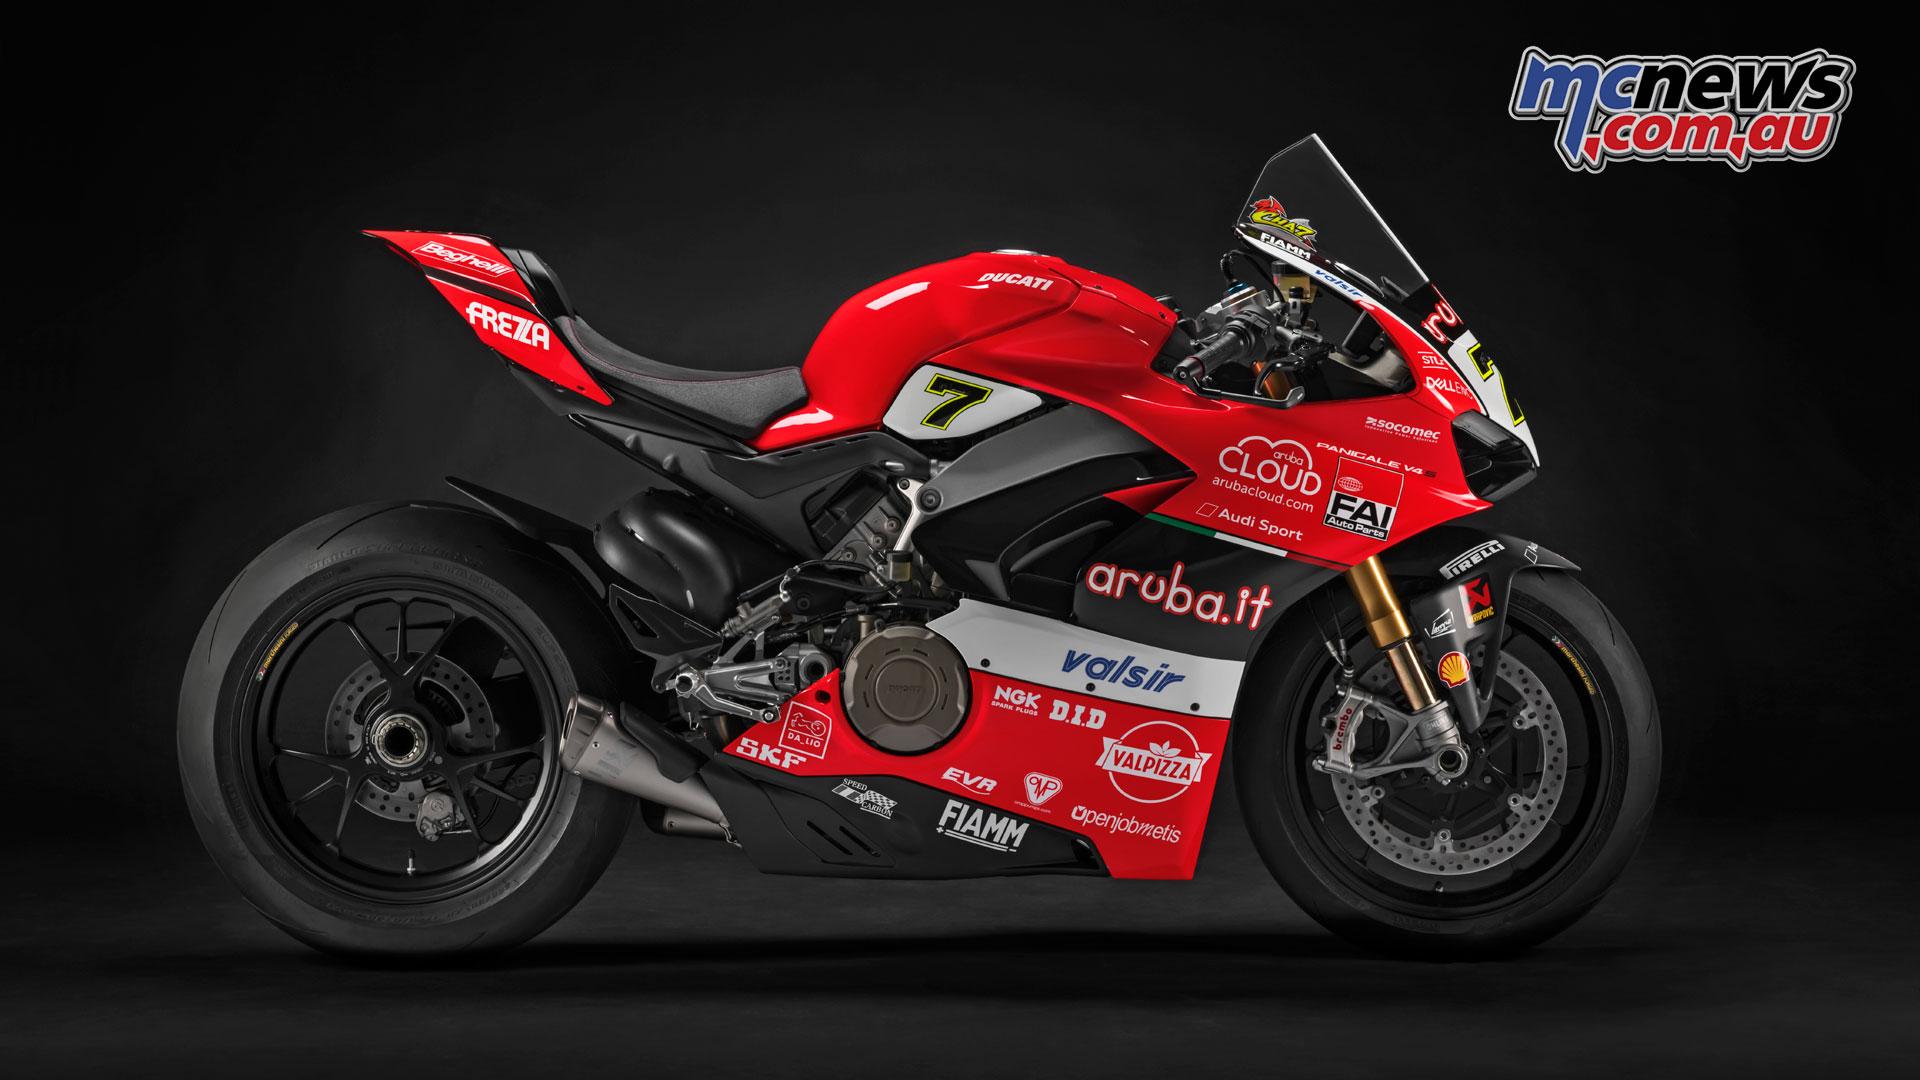 Alvaro Bautista on Aruba Ducati Panigale V4 for WSBK 2019 | MCNews.com.au